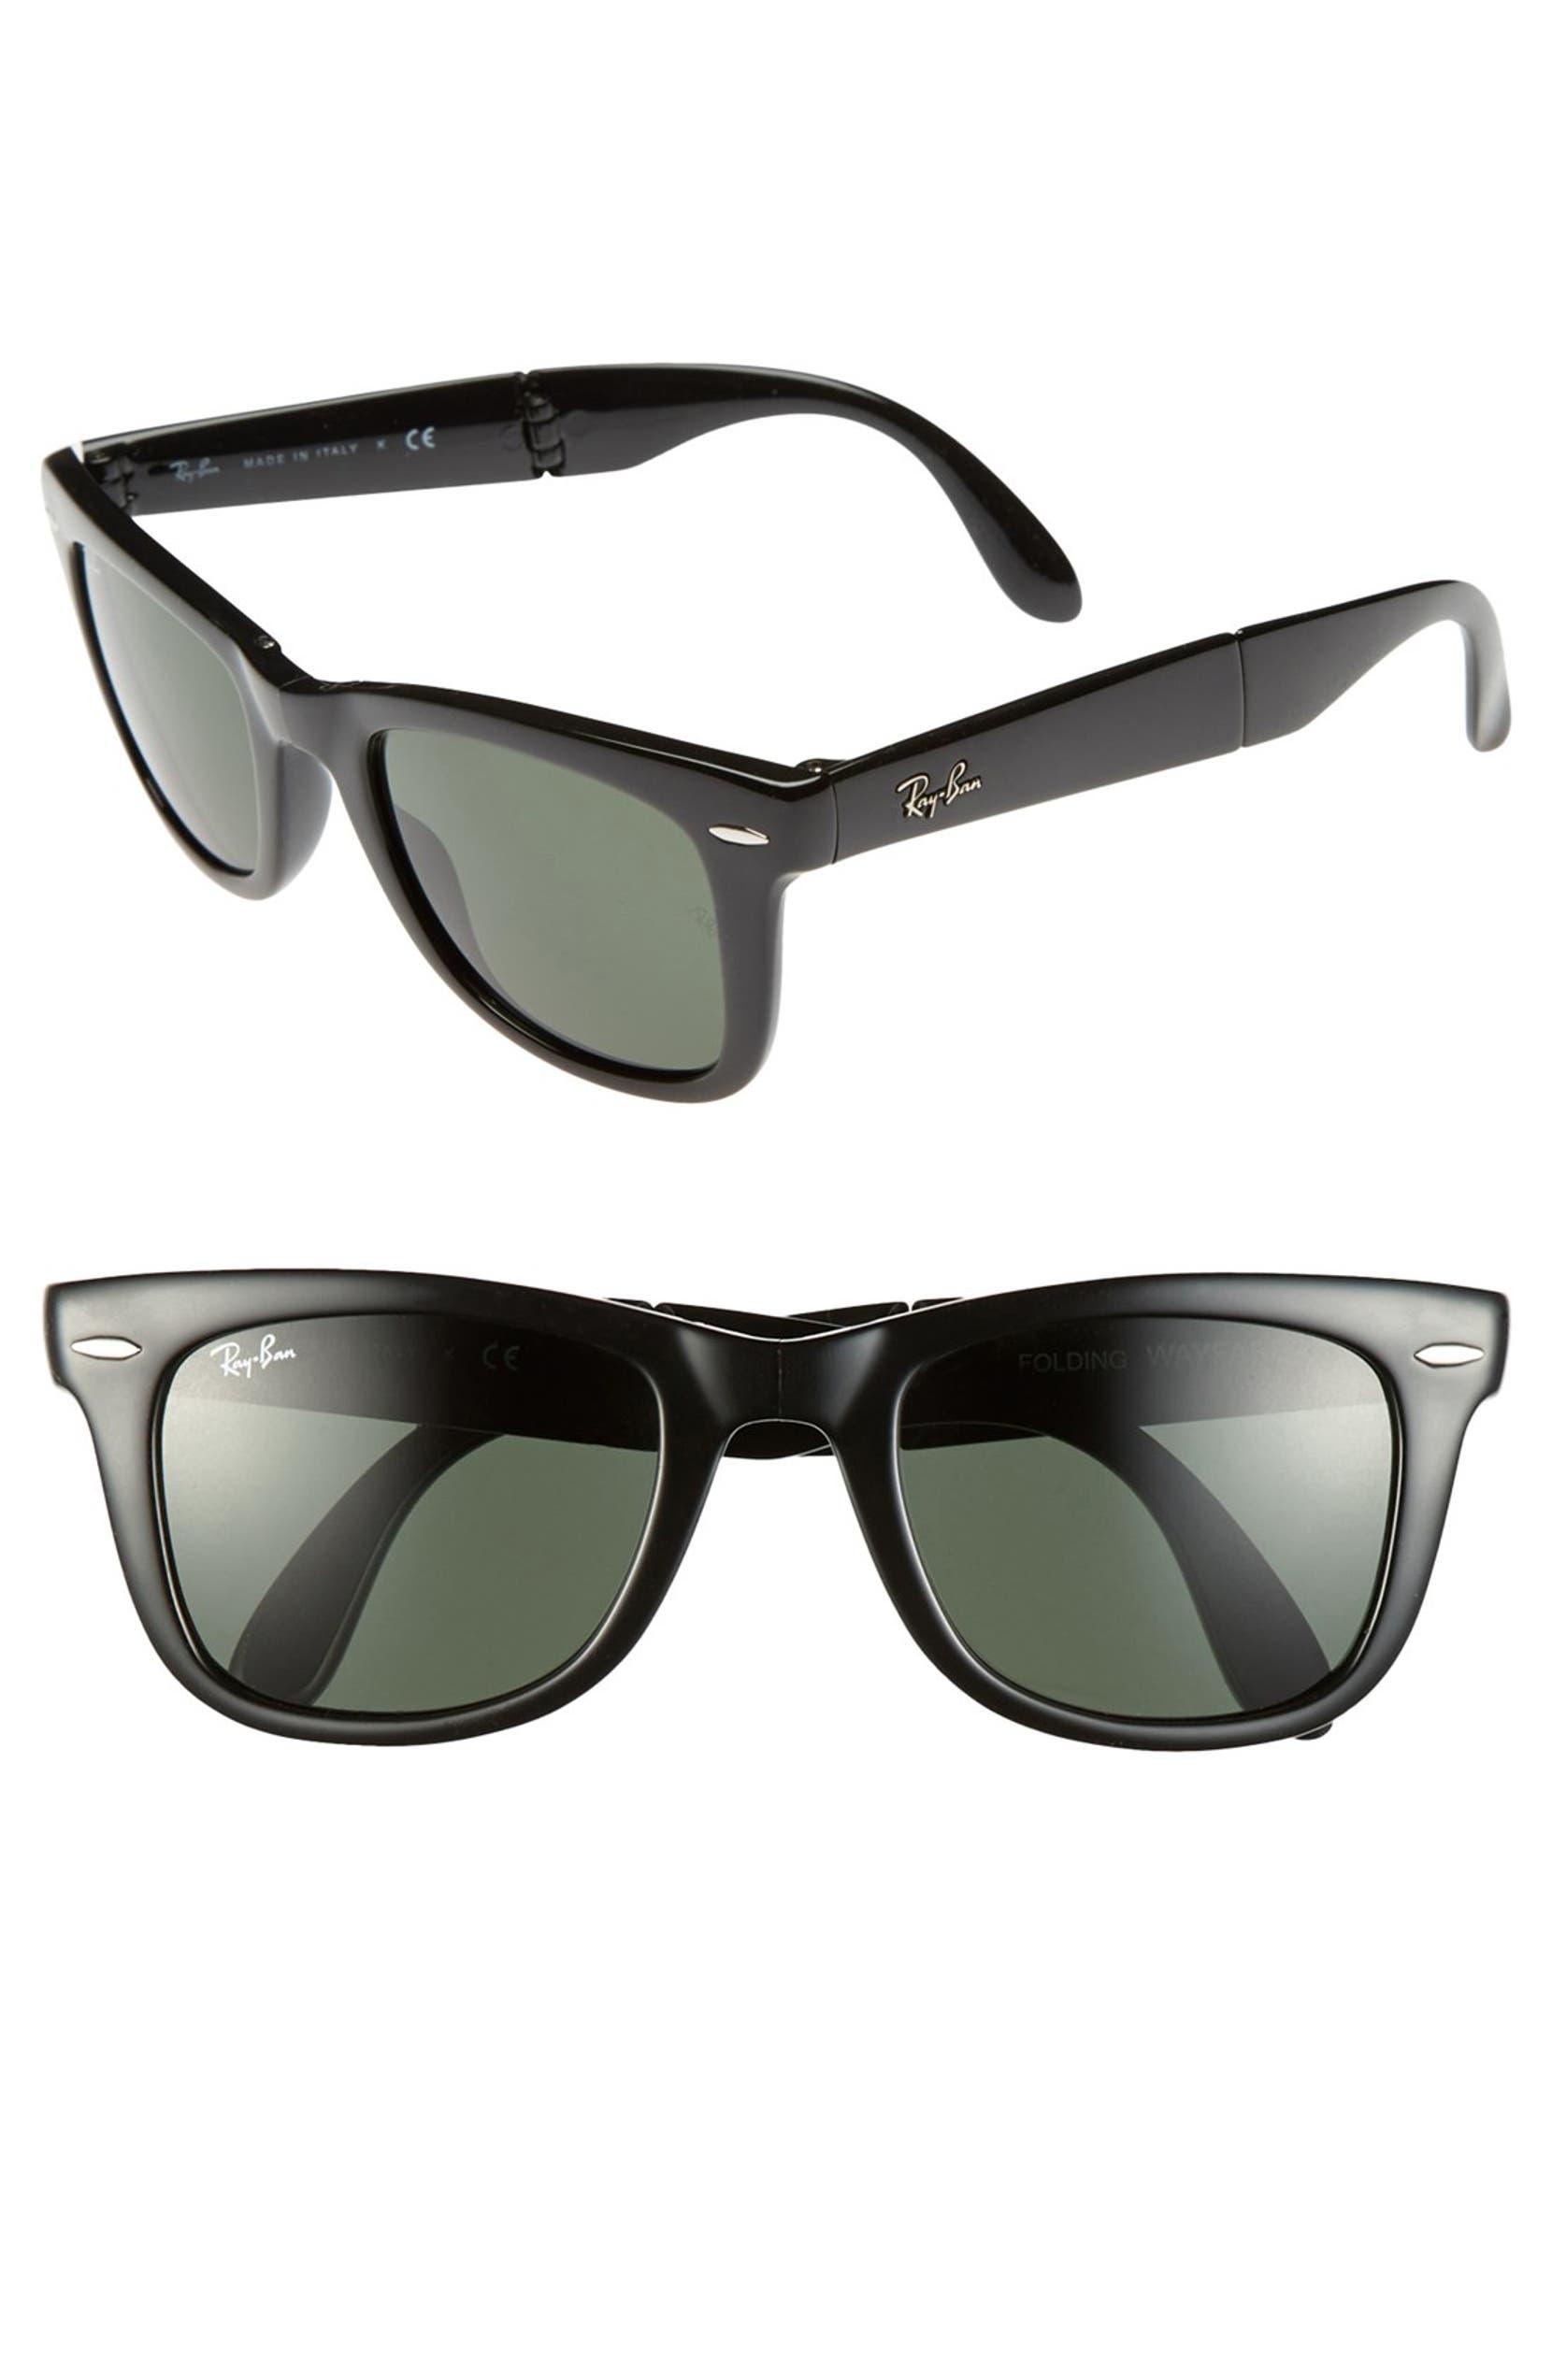 152c665d2a8 Ray-Ban Standard 50mm Folding Wayfarer Sunglasses